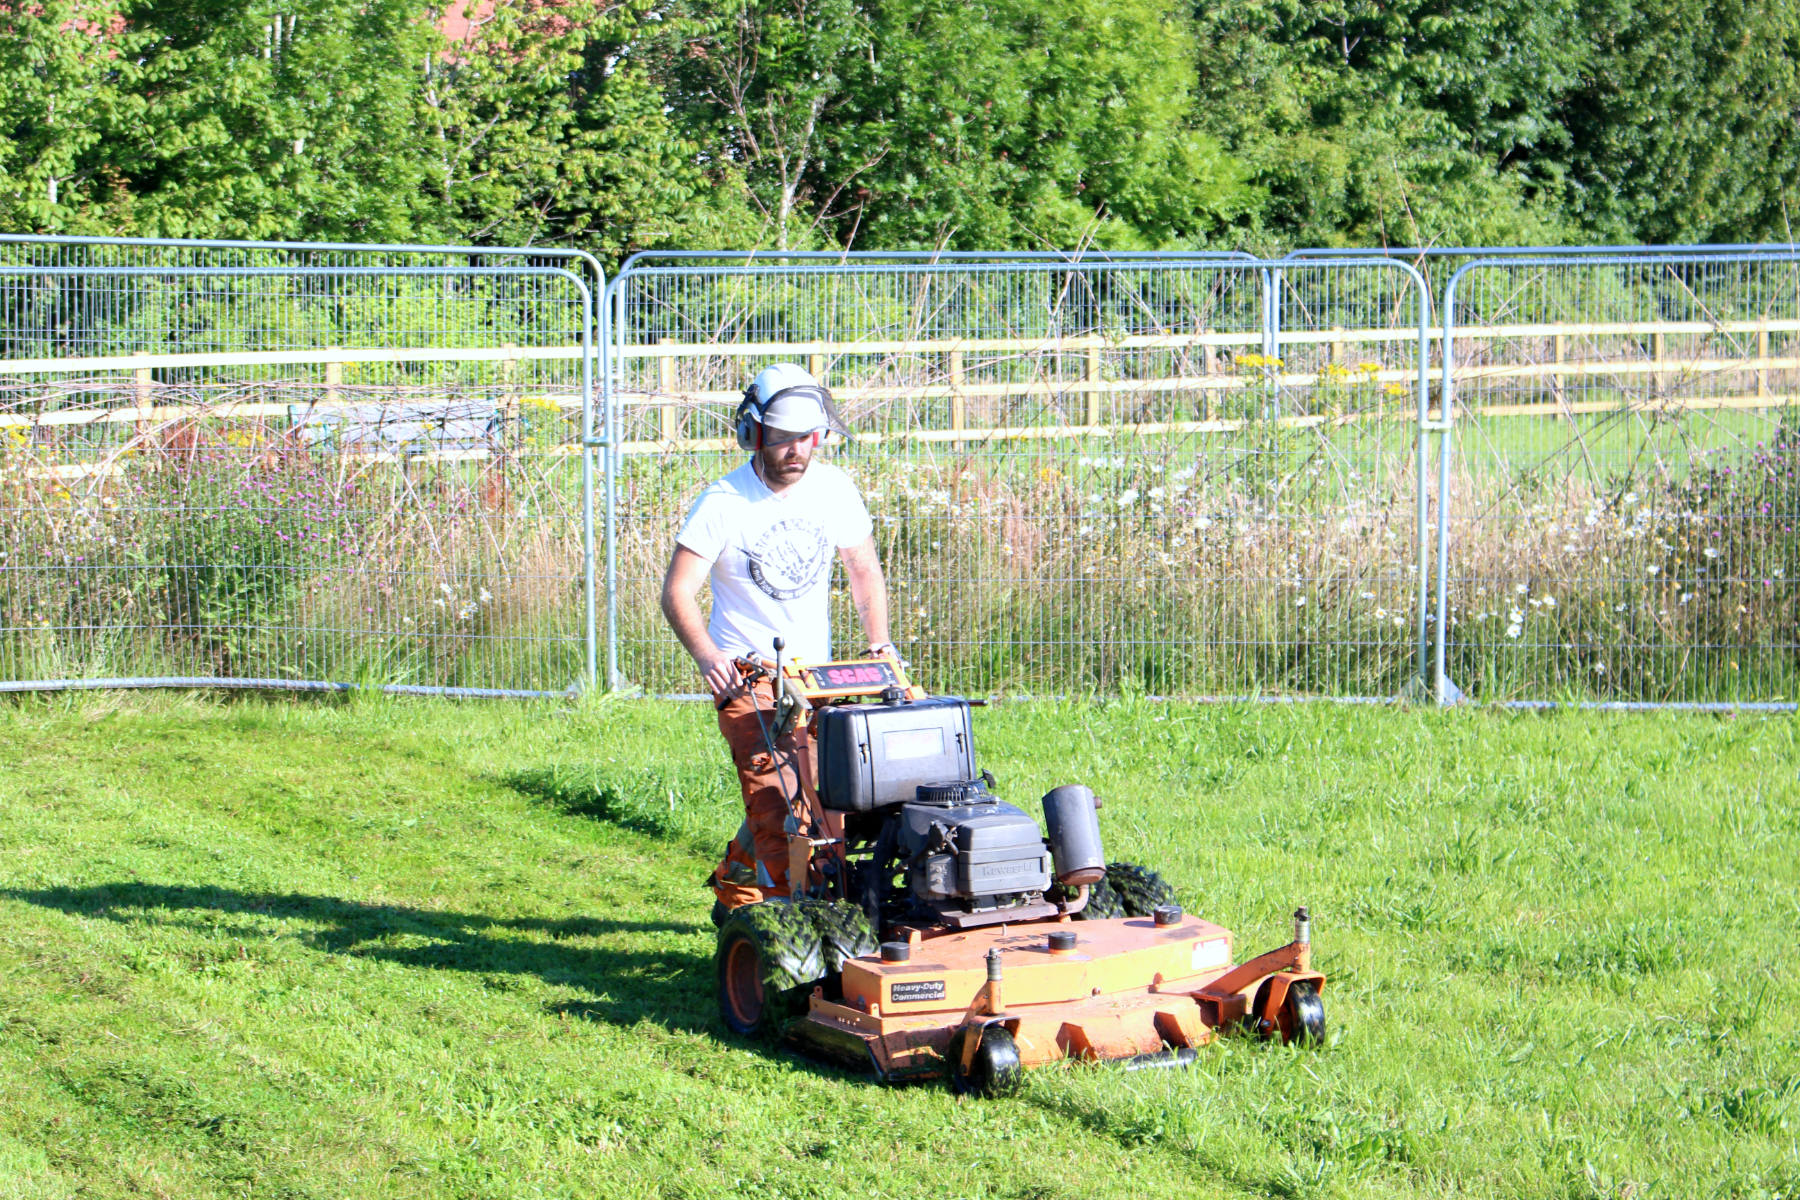 Gentleman Mowing Grass